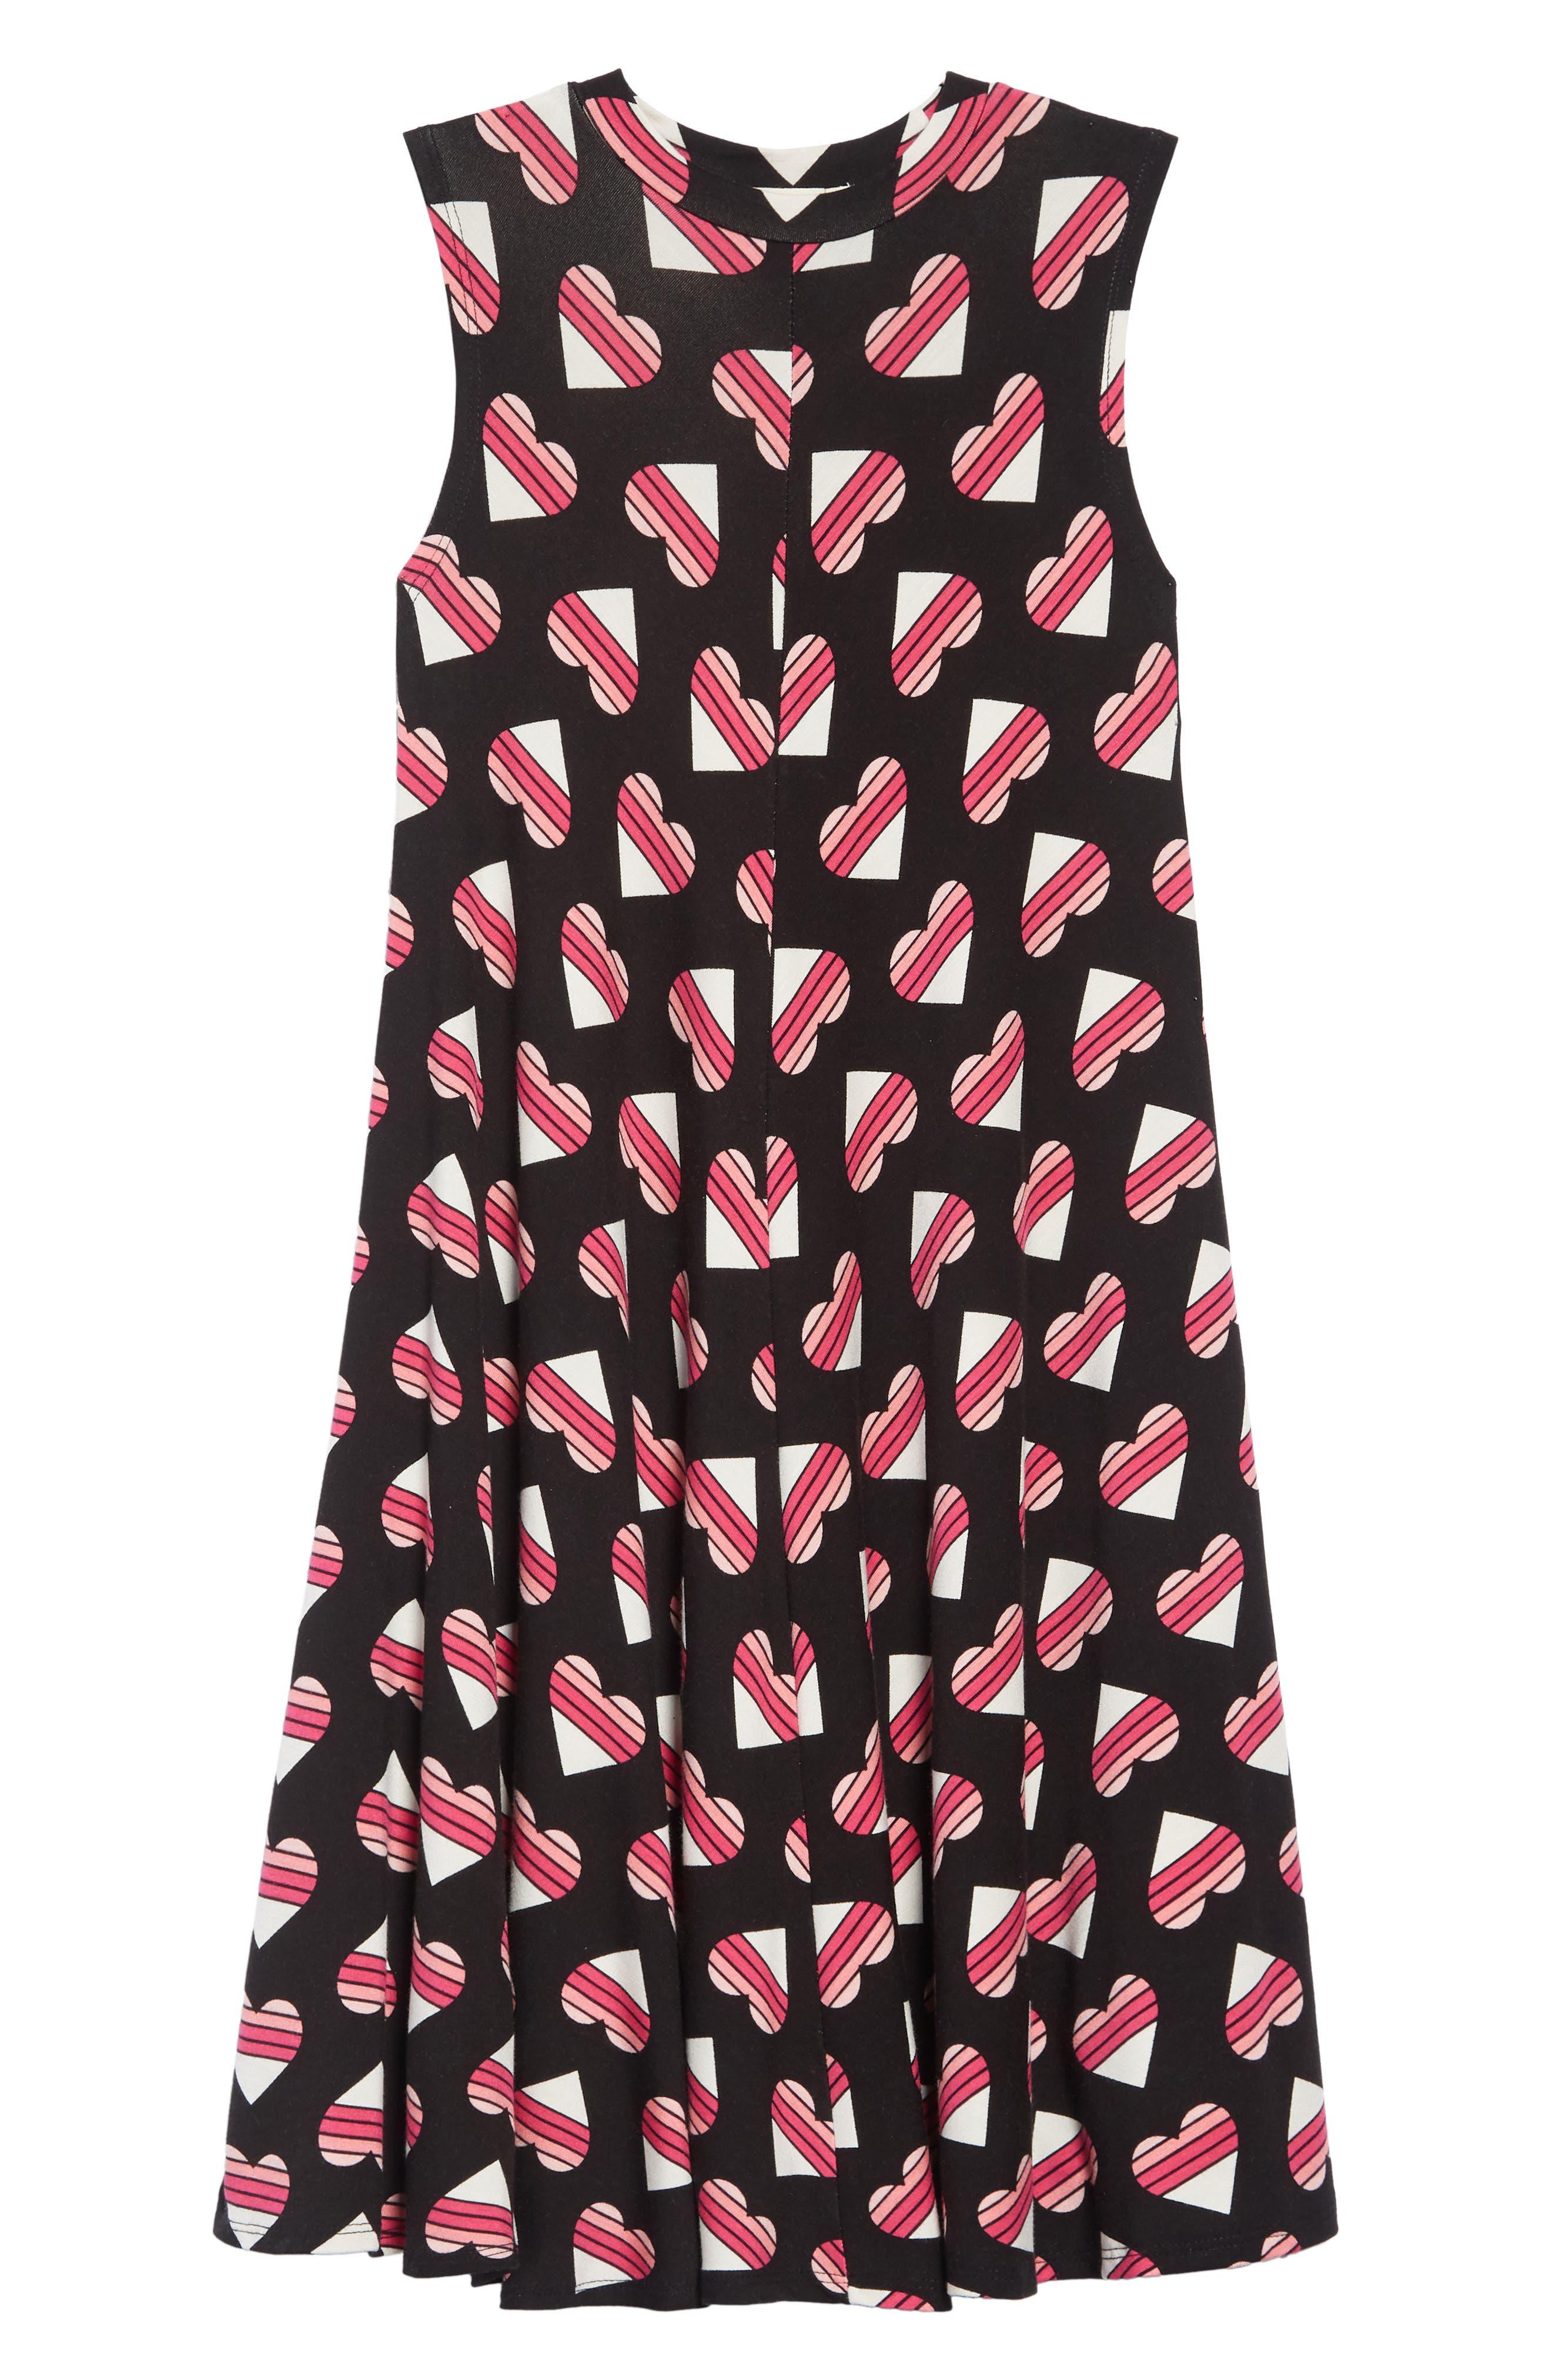 TUCKER + TATE Print Sleeveless Knit Dress, Main, color, BLACK MULTI HEARTBREAKER